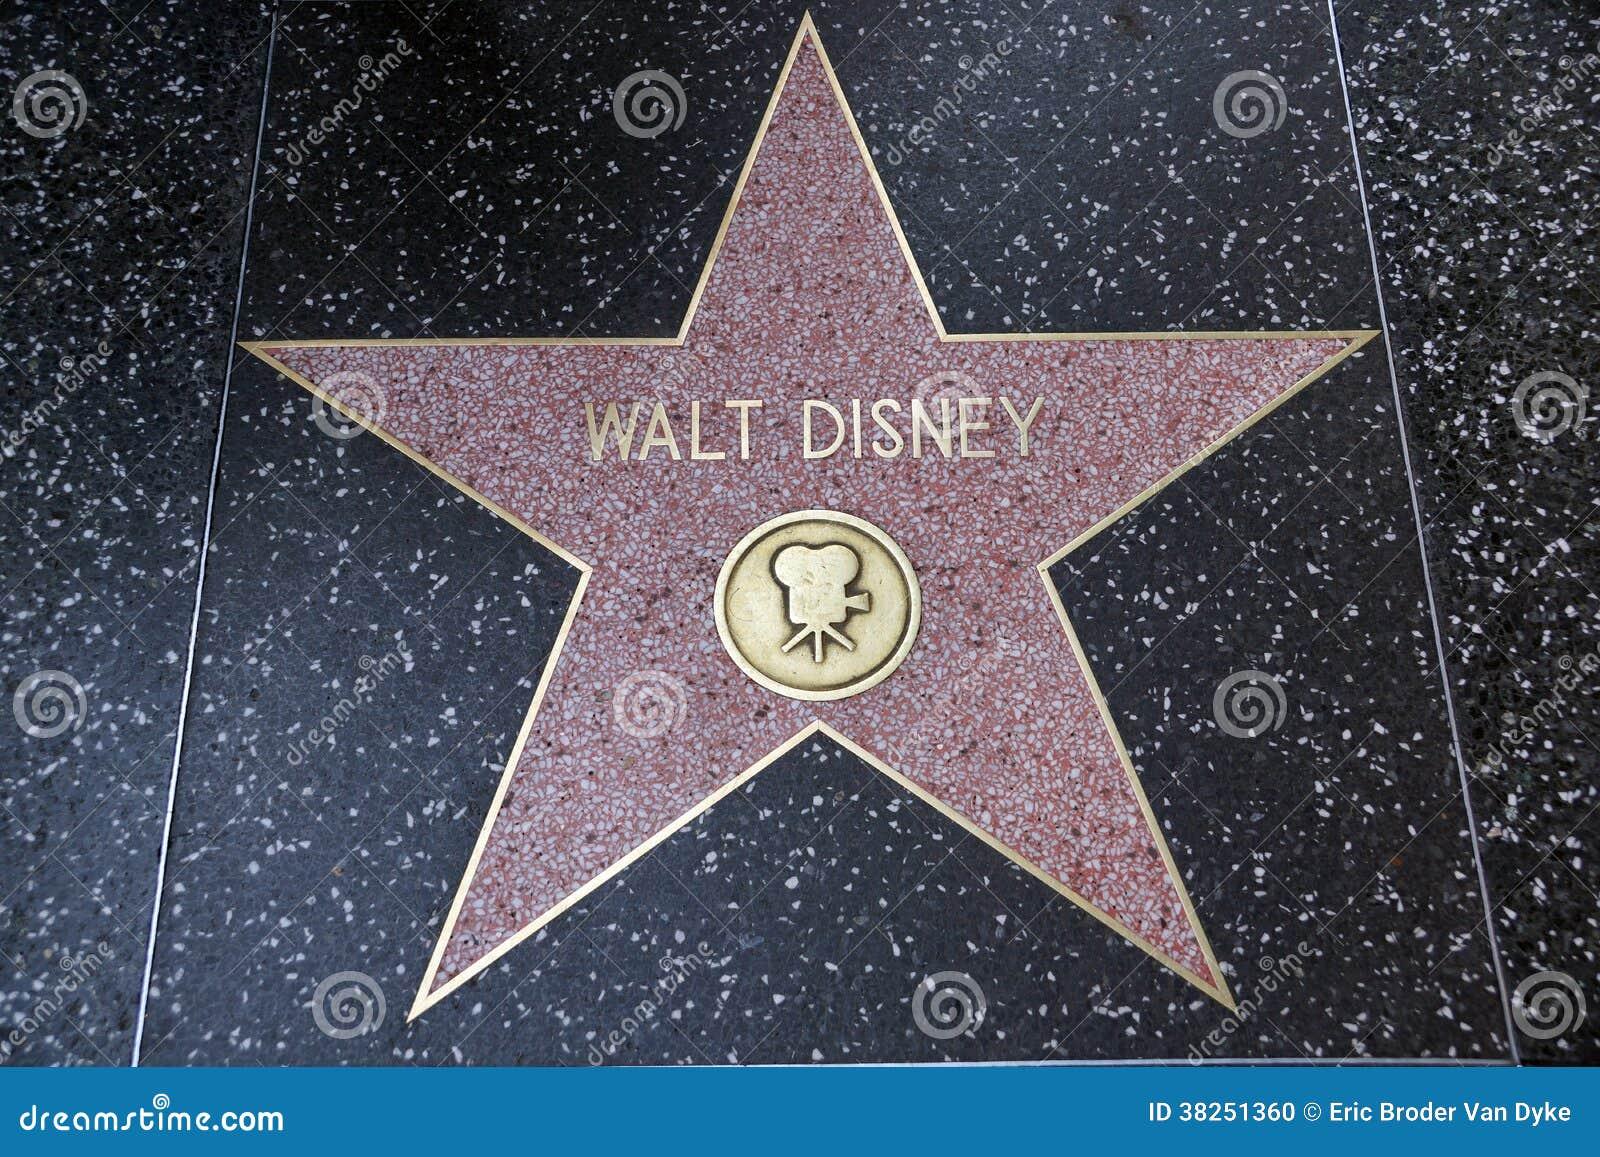 walt disney s star on hollywood walk of fame editorial